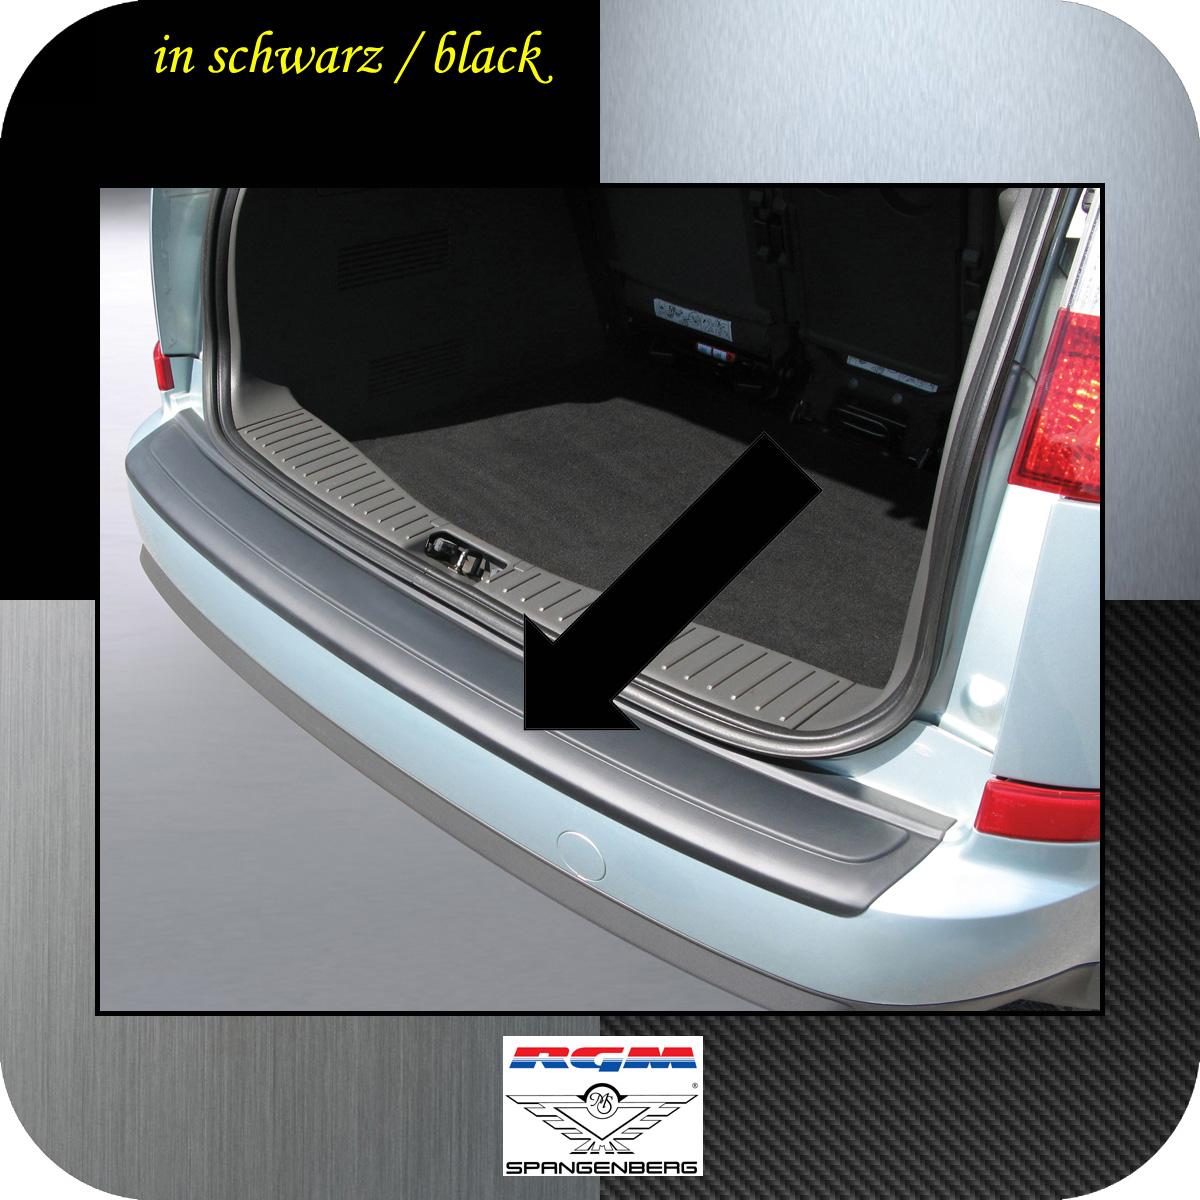 Ladekantenschutz schwarz Ford C-MAX I Van Kombi ab facelift 2007-10 3500175